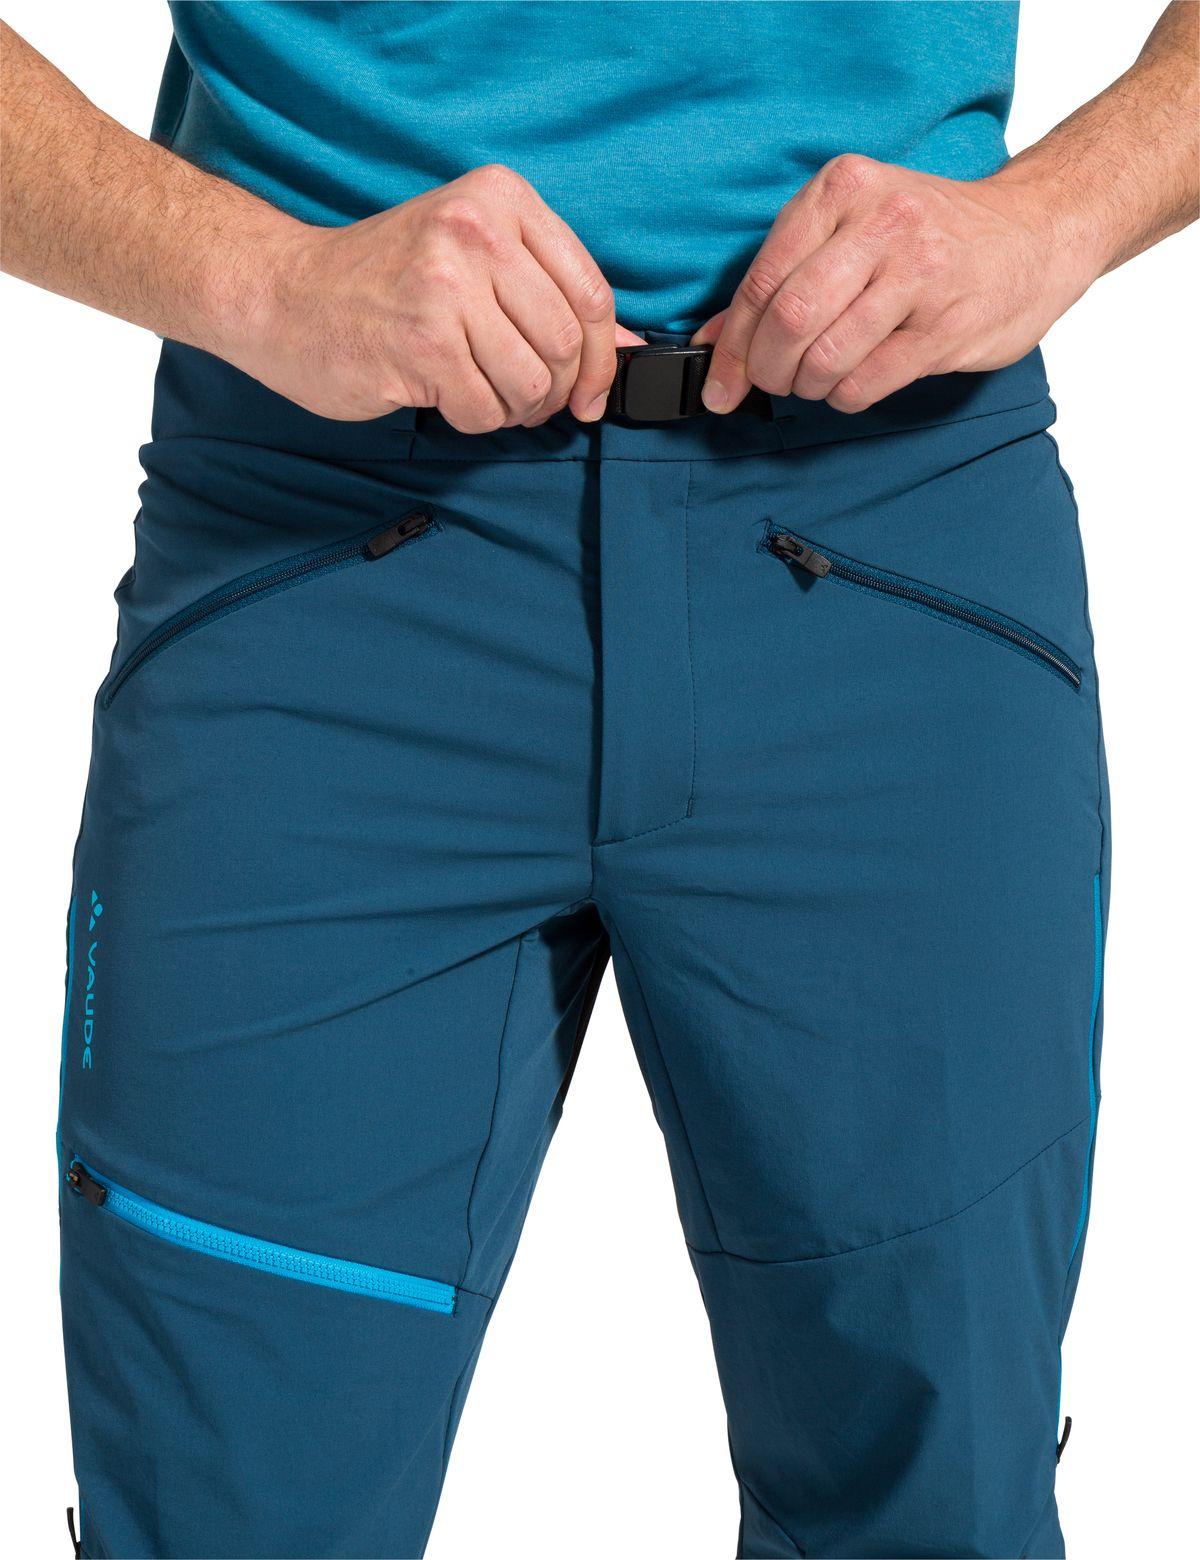 Vaude Croz Pants